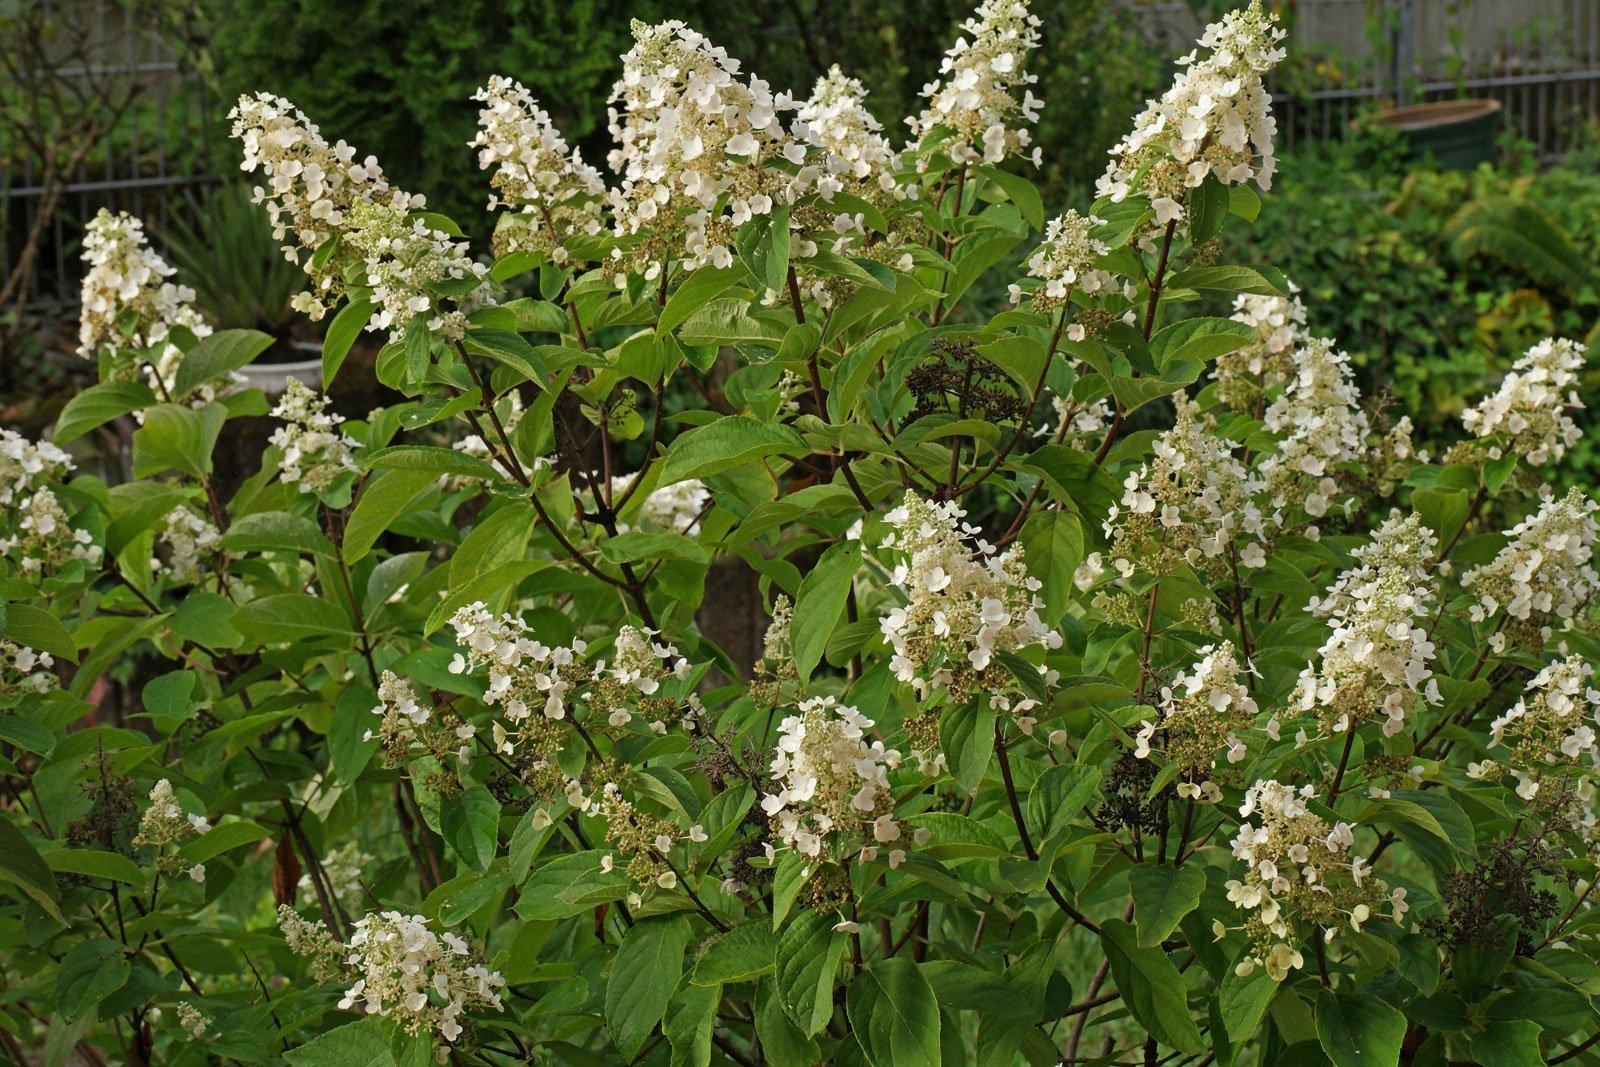 Arbusto Fiori Bianchi.Hydrangea Paniculata Cv